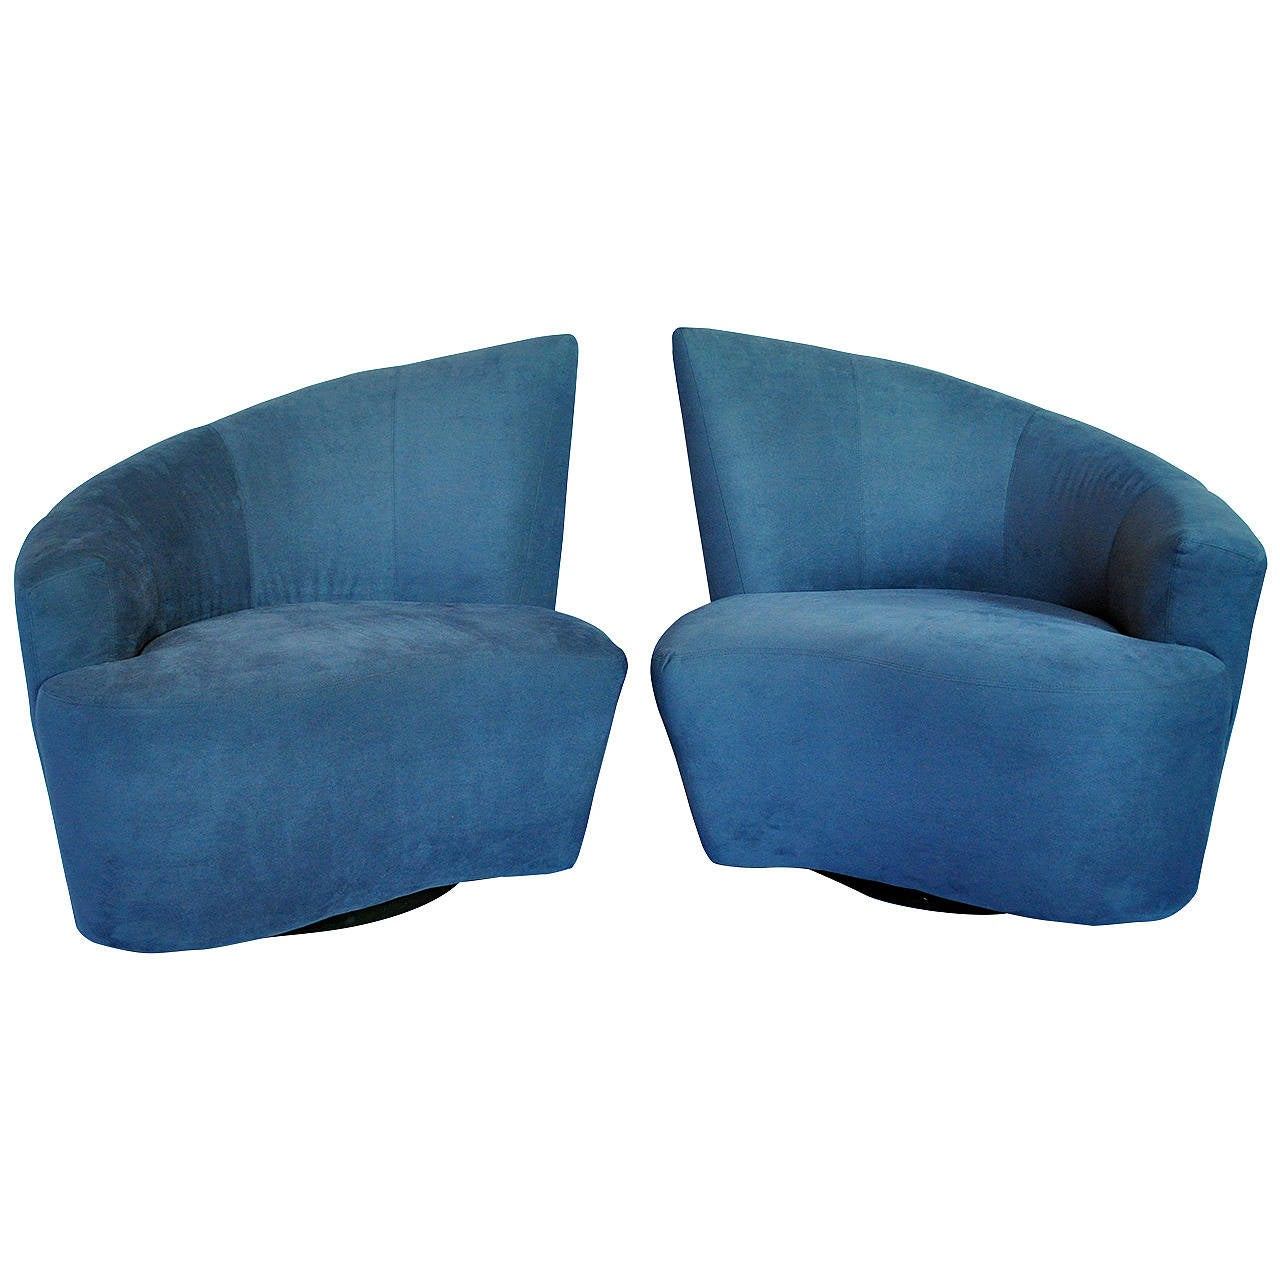 swivel lounge chairs amazon stretch chair covers vladimir kagan bilbao for weiman